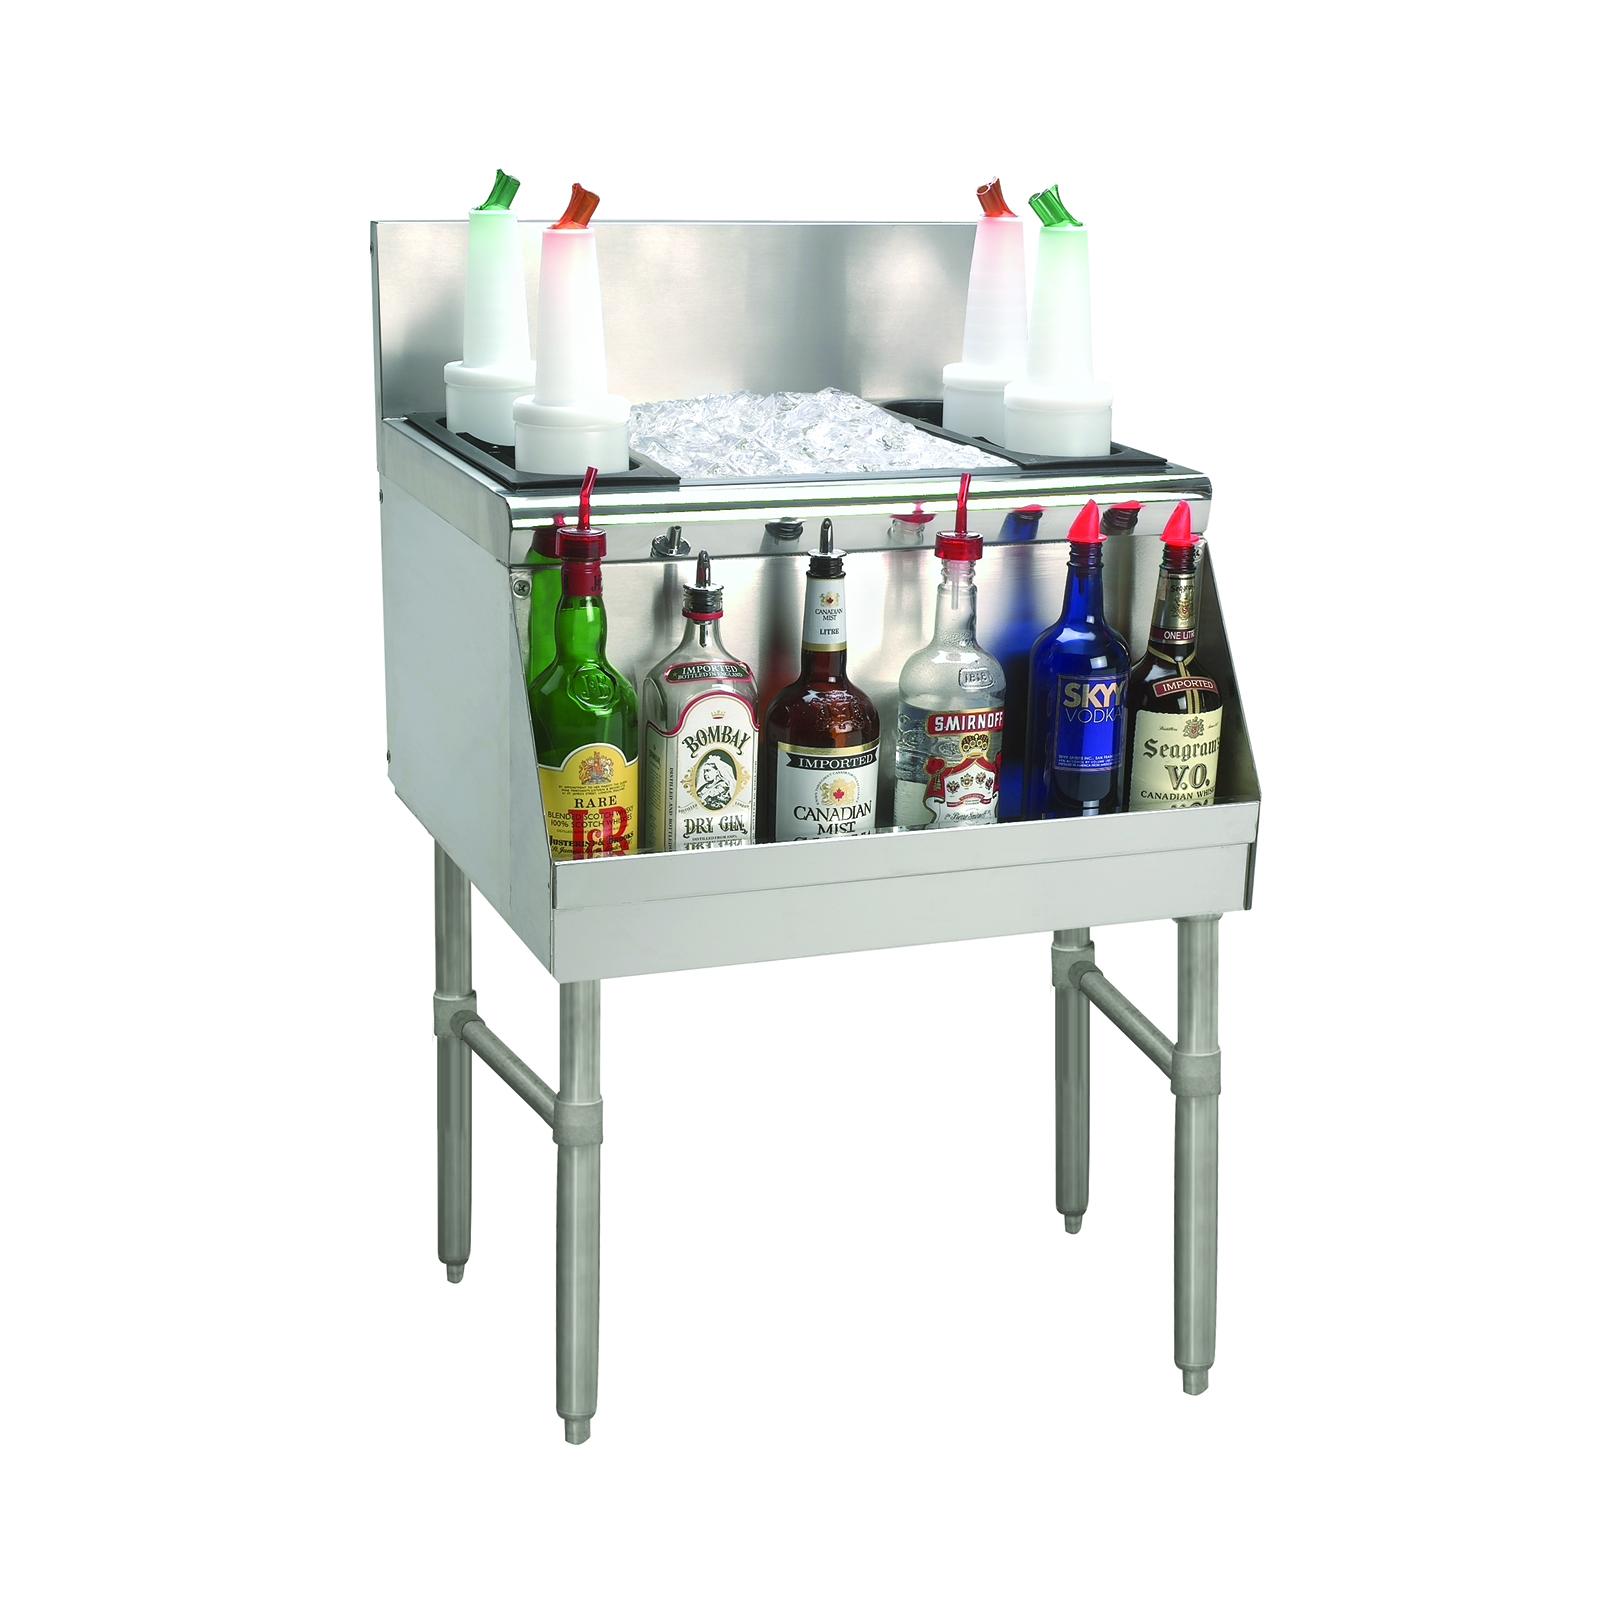 Advance Tabco PRI-24-24D underbar ice bin/cocktail unit